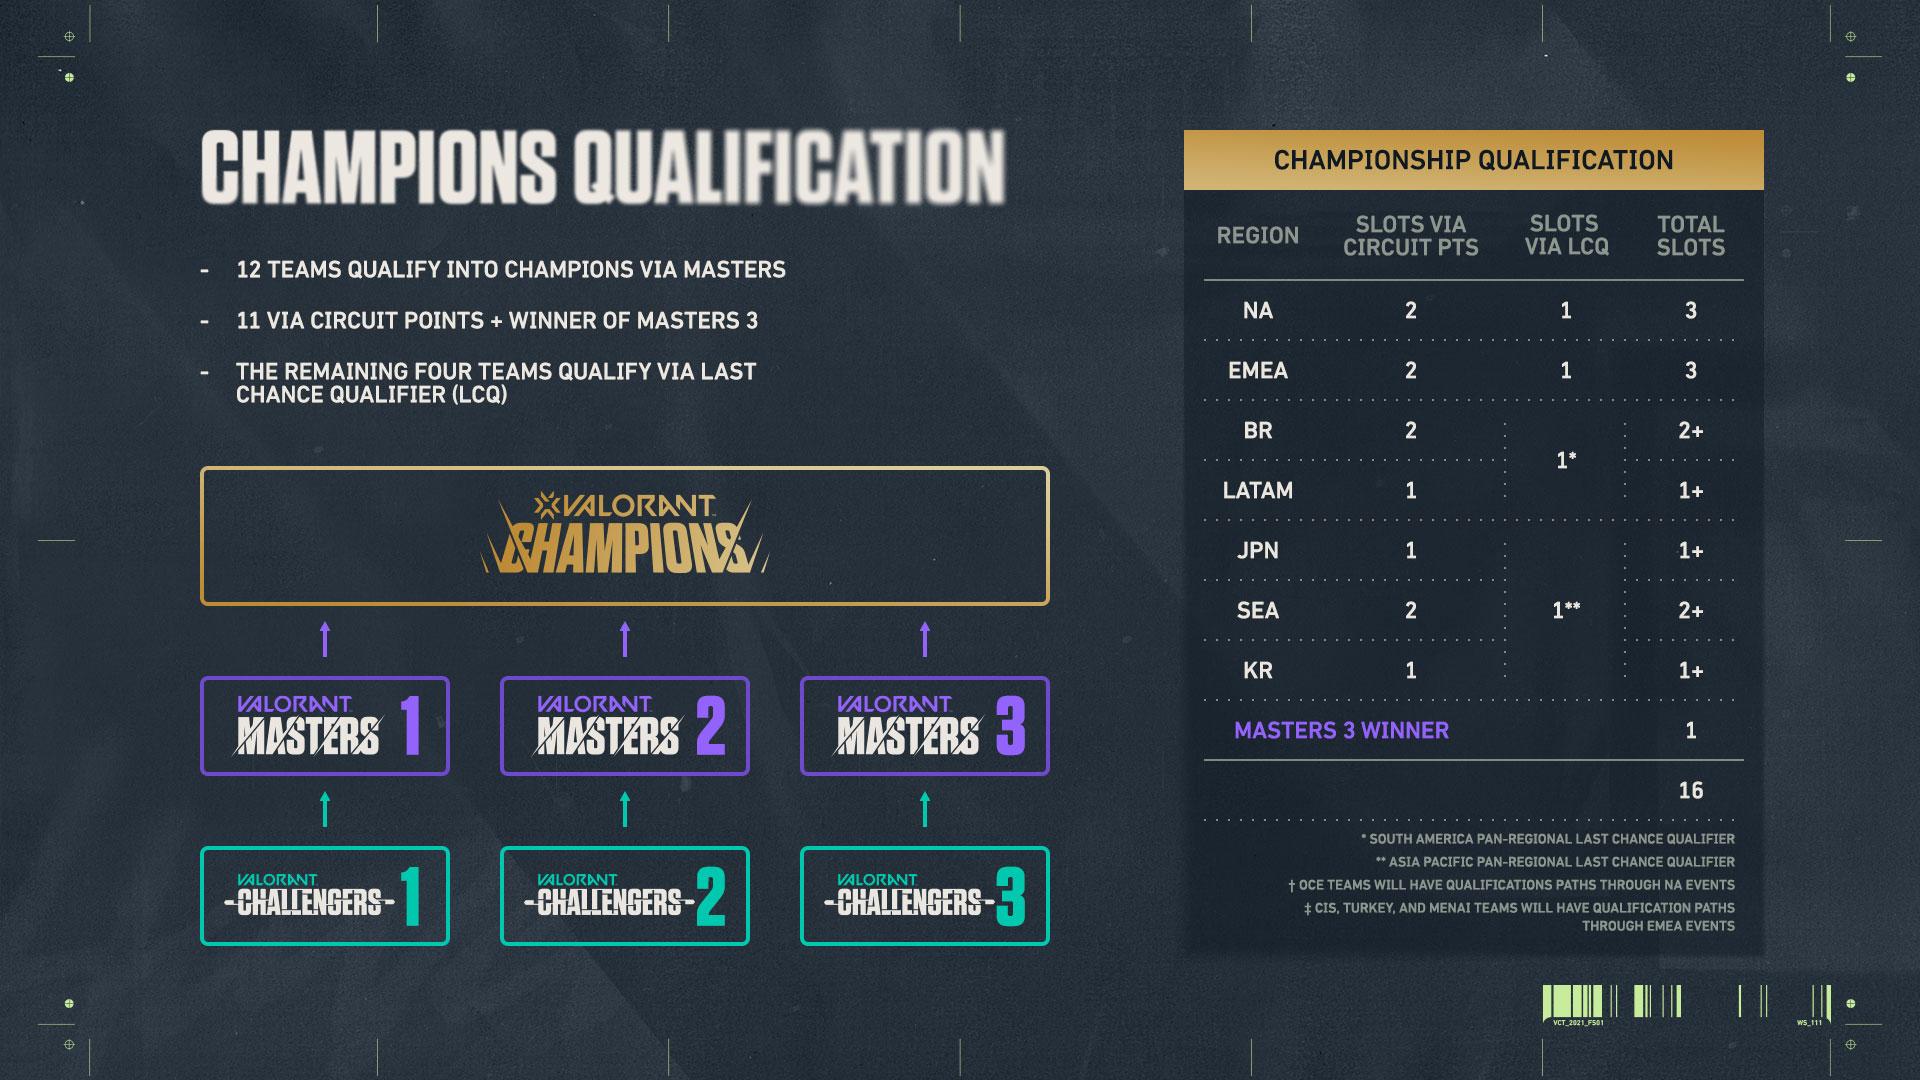 2.CHAMPIONS_QUALIFICATION_GRAPHIC.jpg